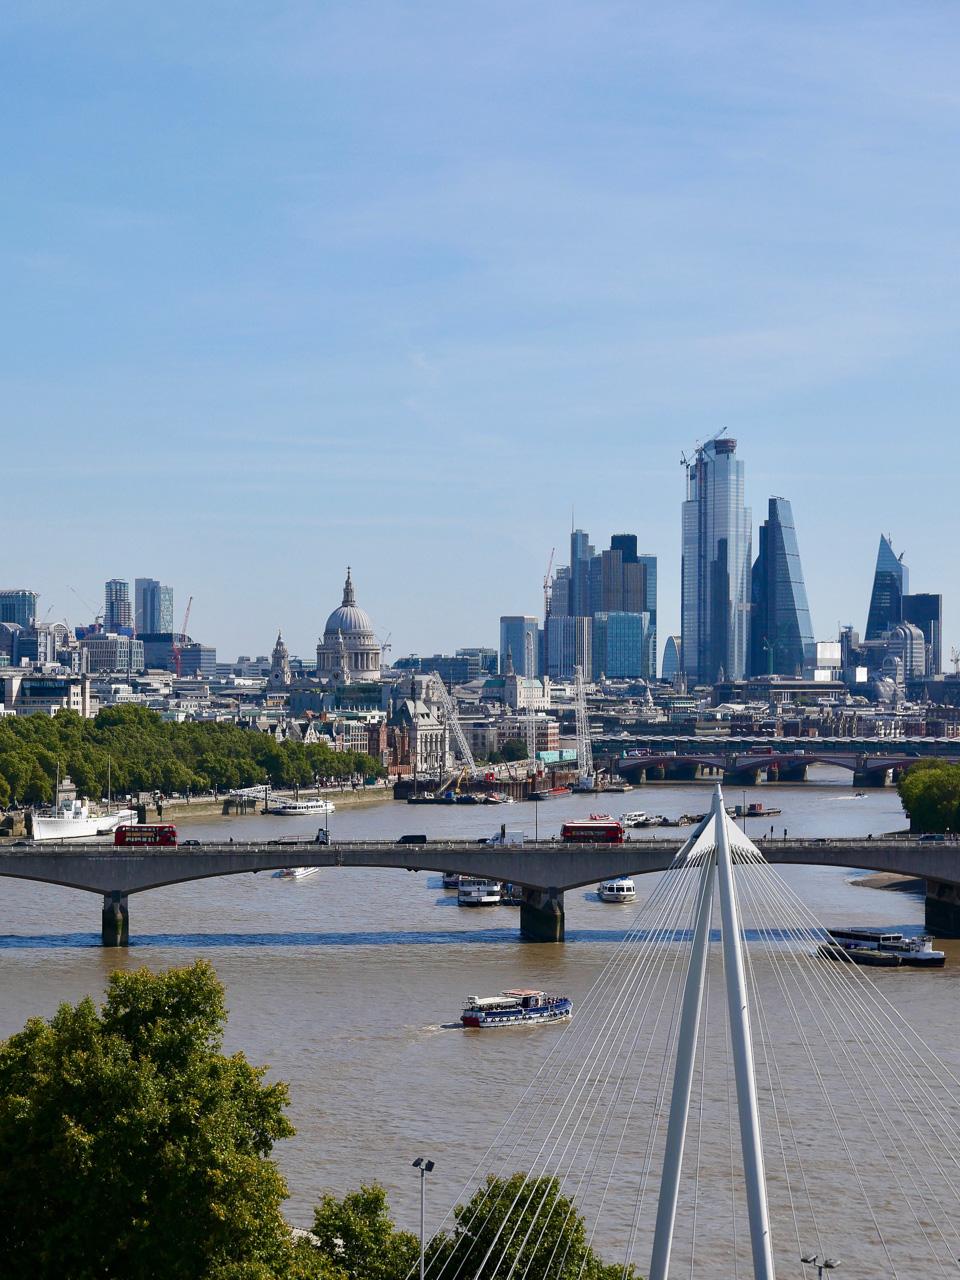 Cara Sharratt Travel - View of London from Corinthia - London, England